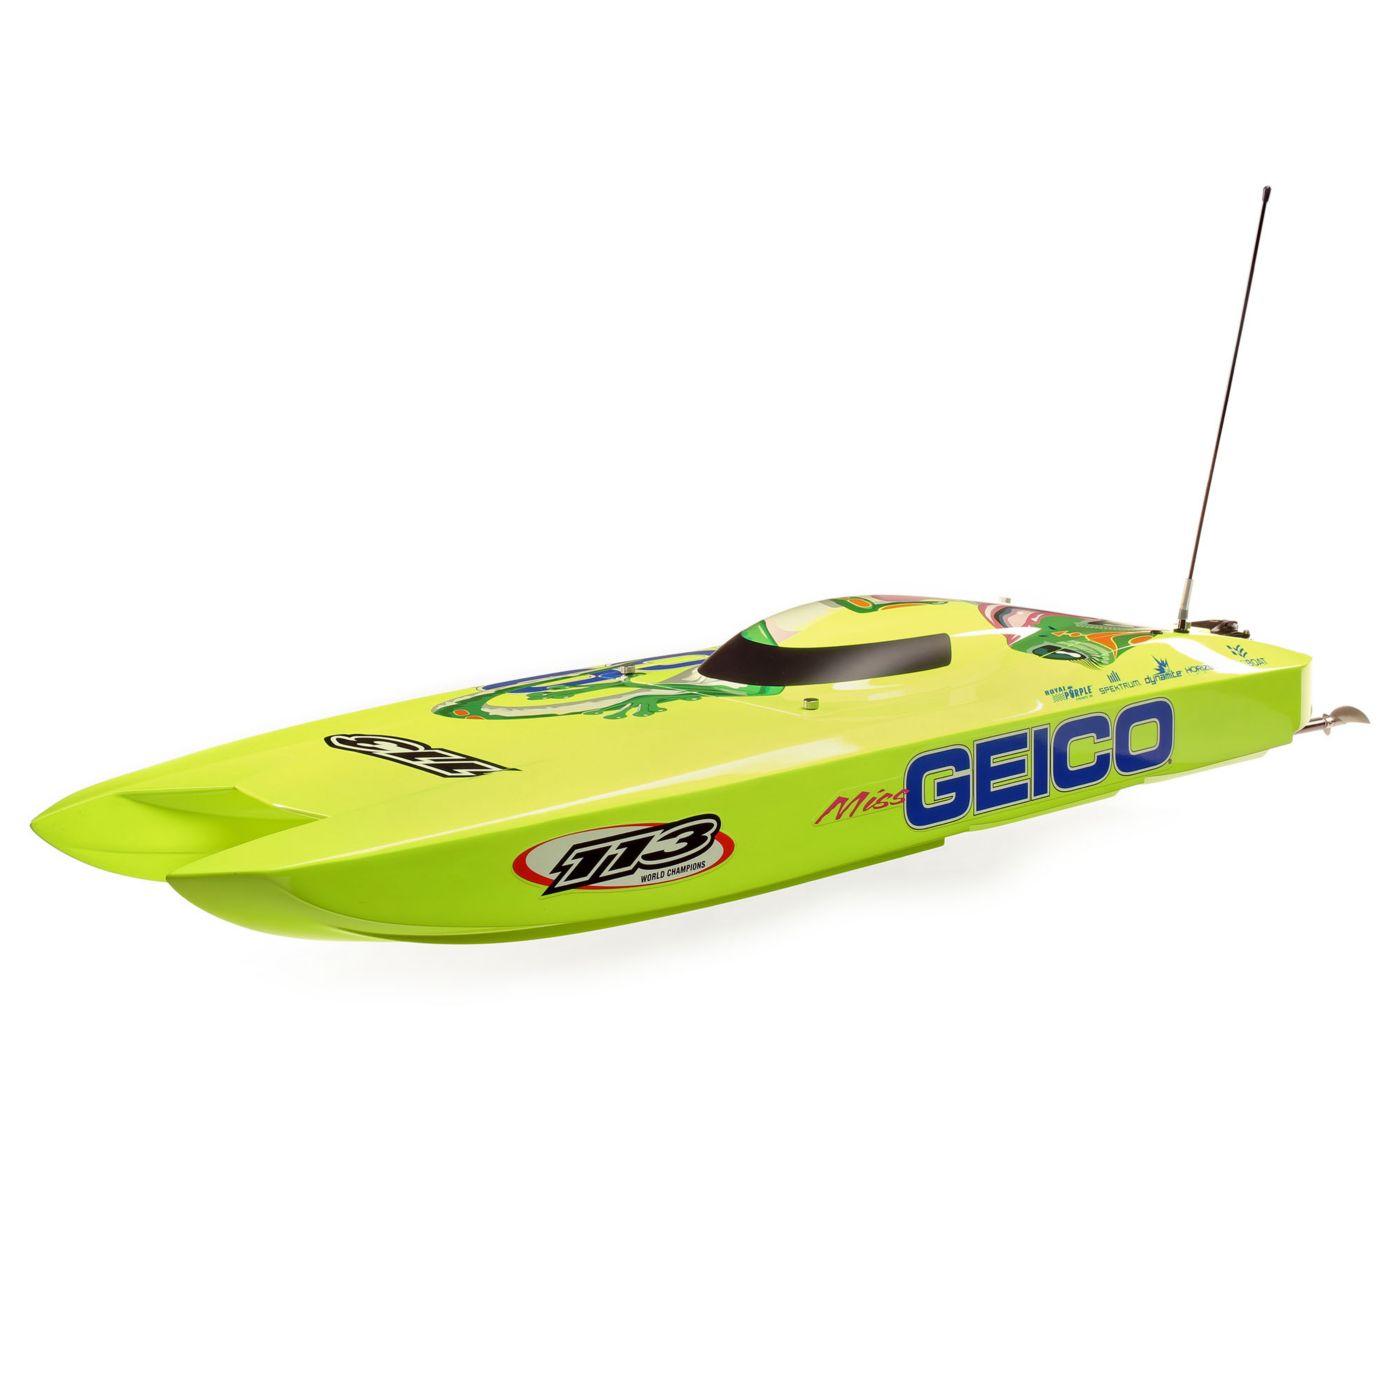 Summertime Fun: Pro Boat Miss Geico Zelos 36″ Brushless Twin Catamaran